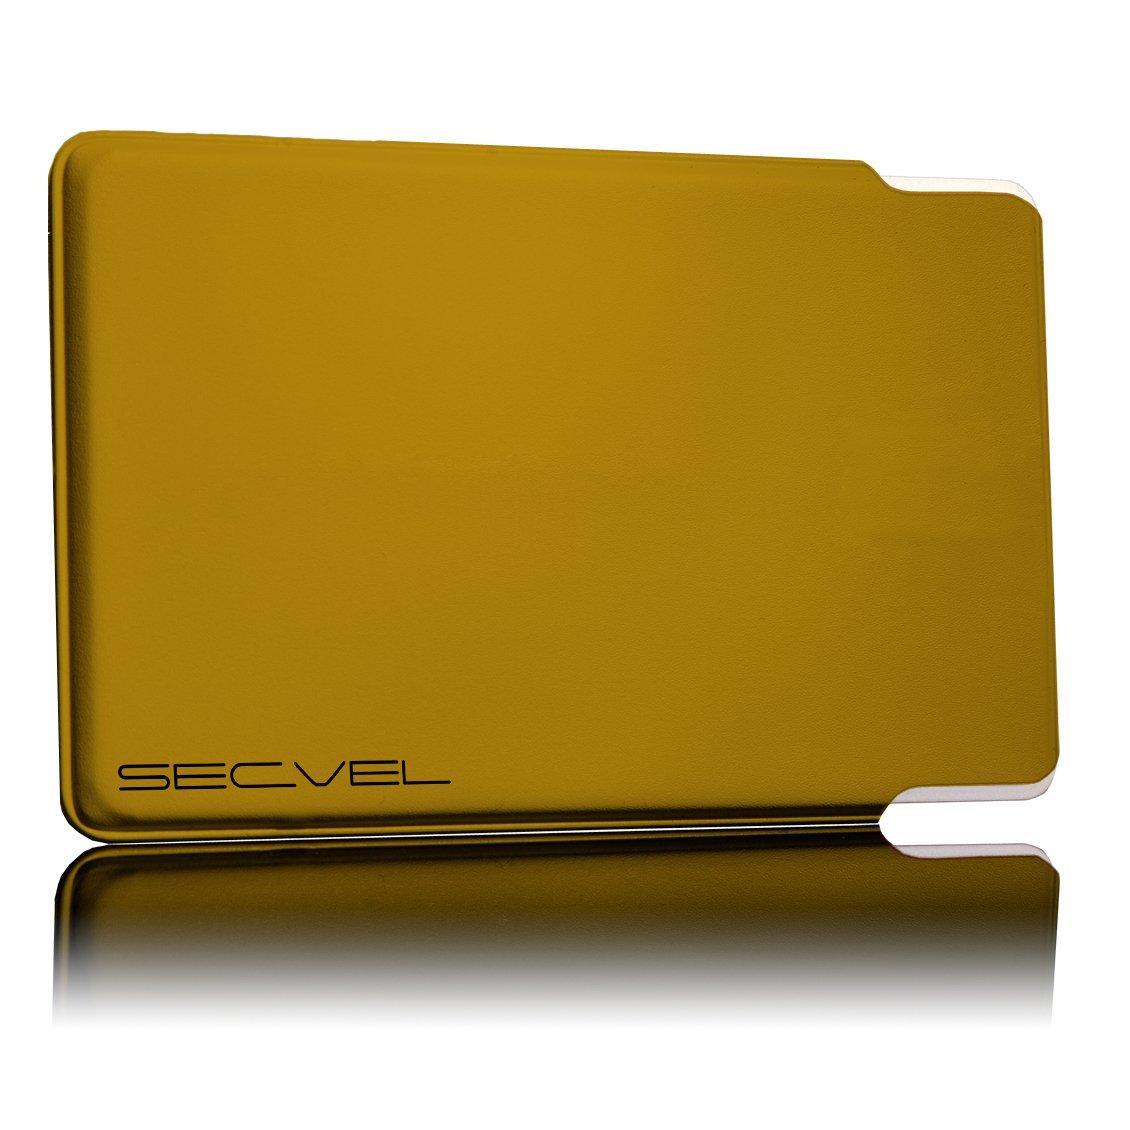 SECVEL Tür Kreditkarte Young Style–Schutz rfid-/NFC & Magnetfelder–Spring SECVEL Technologies GmbH